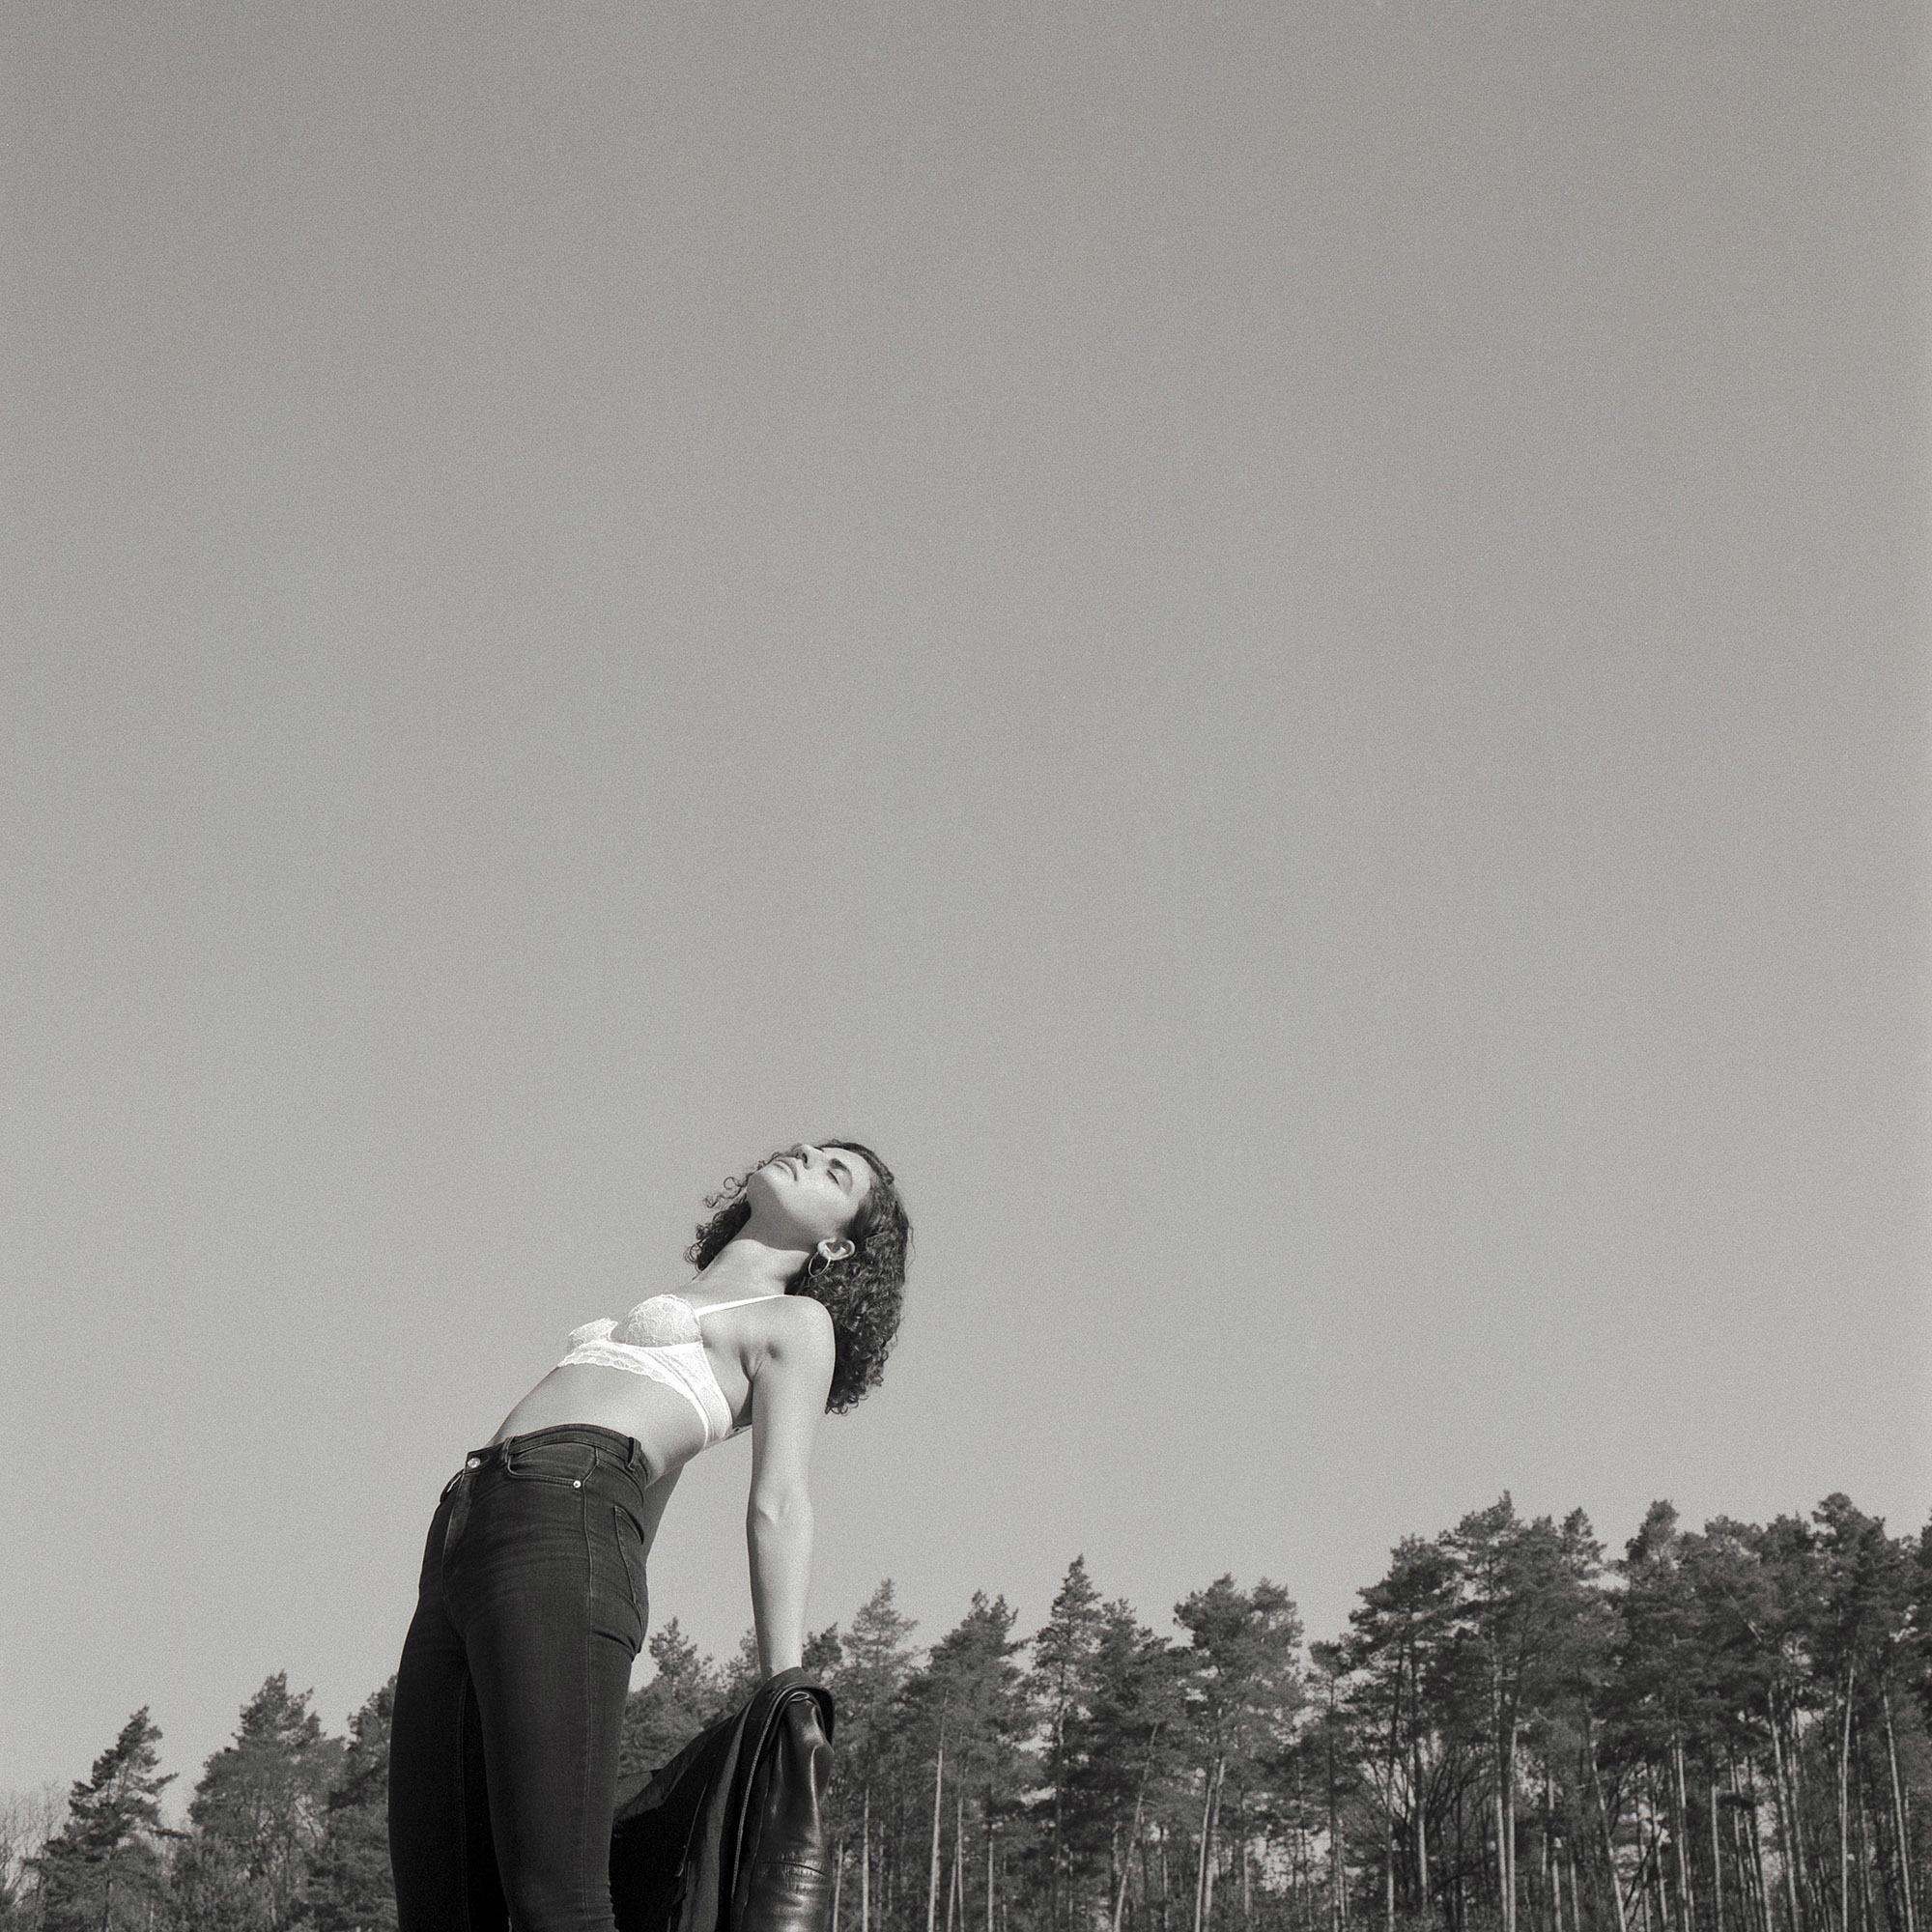 BIRGIT STÖVER ARTISTS: EMIL LEVY